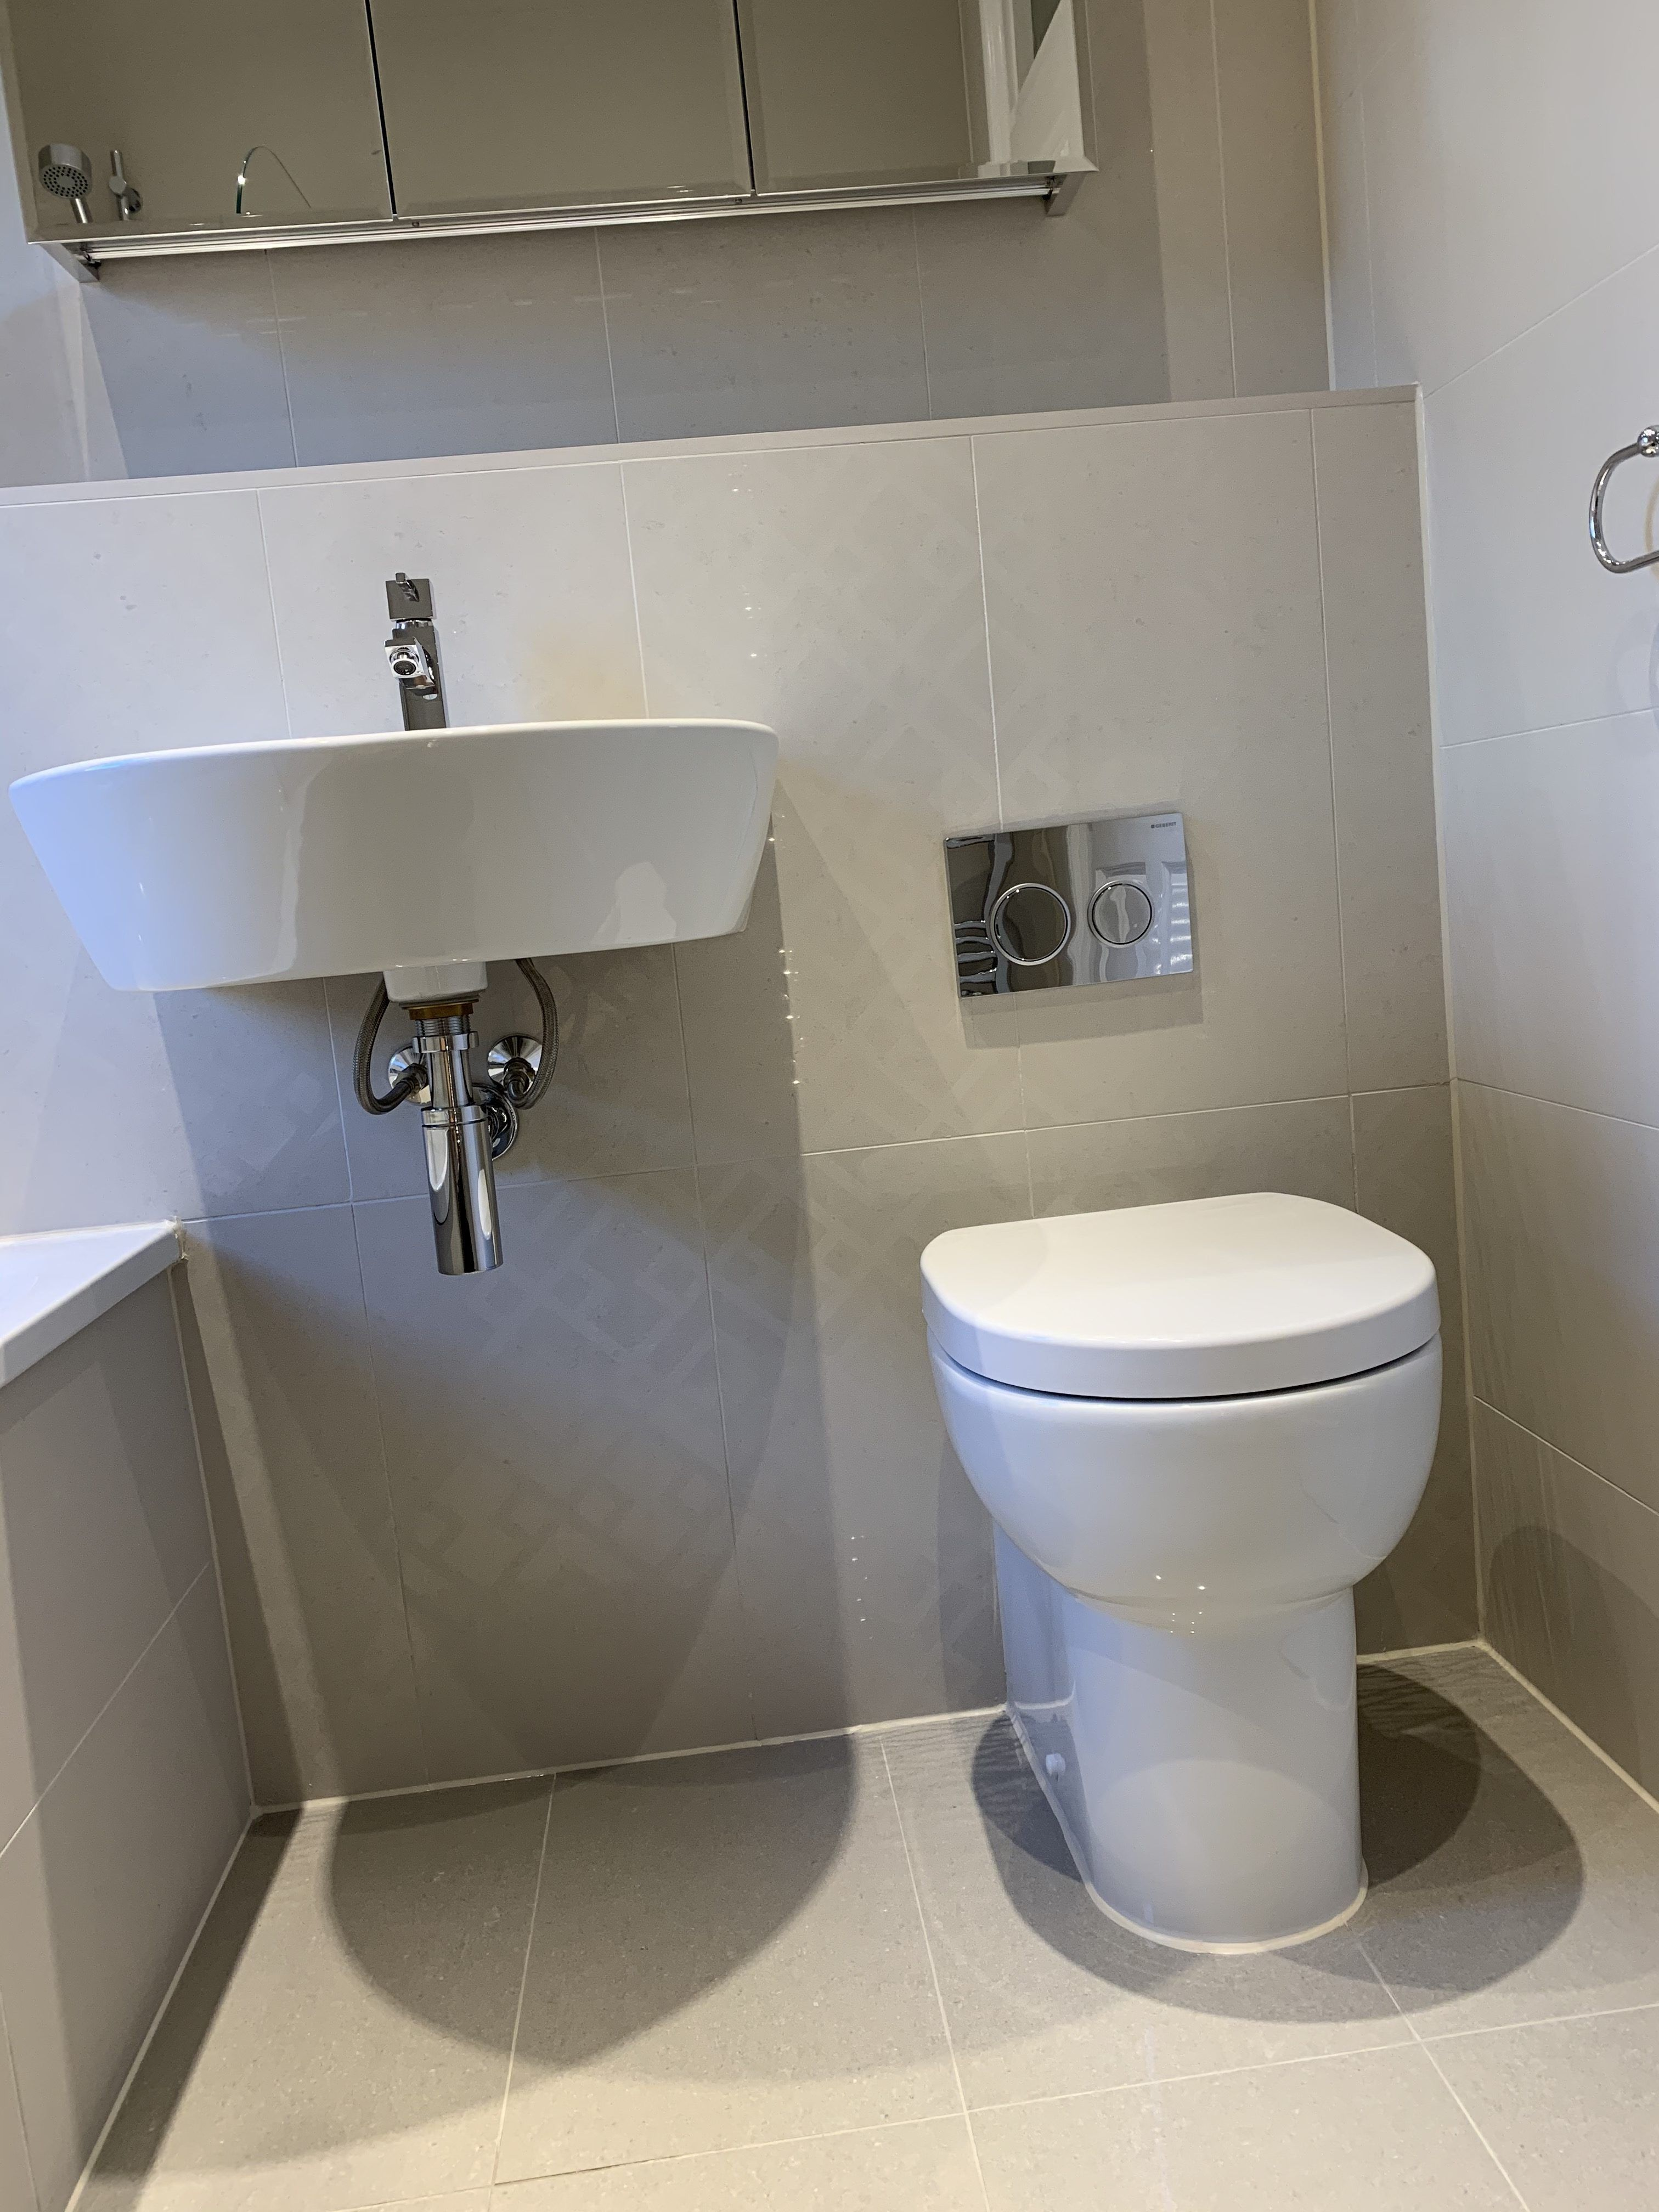 Regal Vanilla Bathroom Topps Tiles In 2020 Topps Tiles Bathroom Tile Bathroom